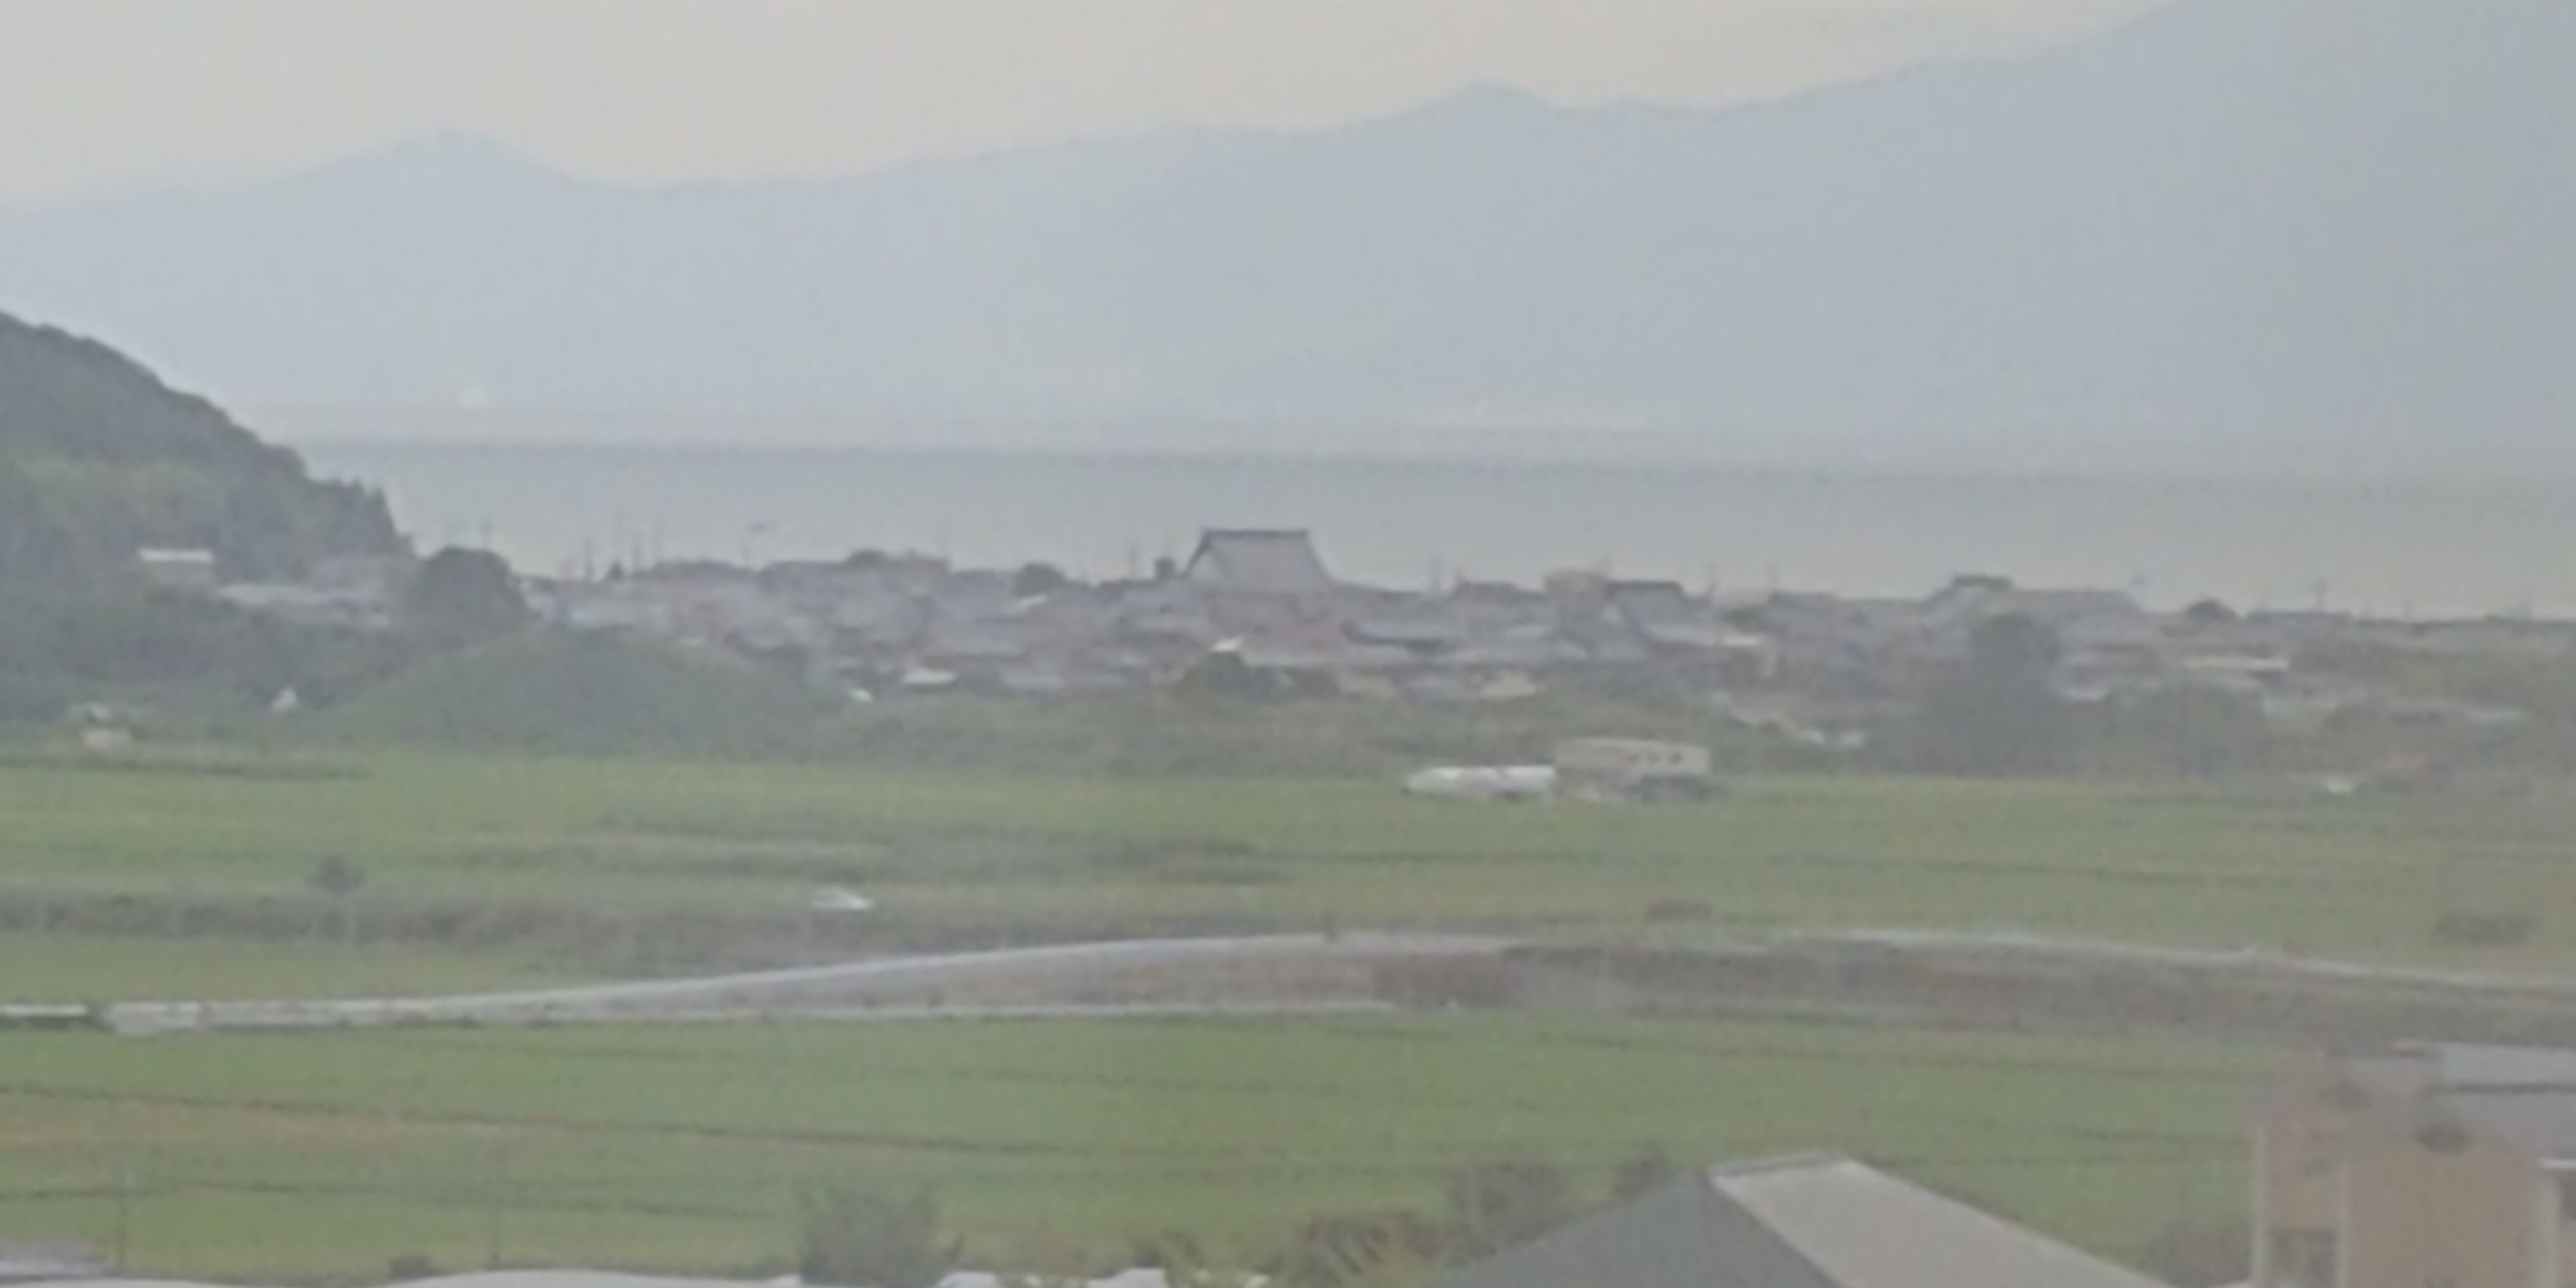 f:id:kishuji-kaisoku:20200119025928j:image